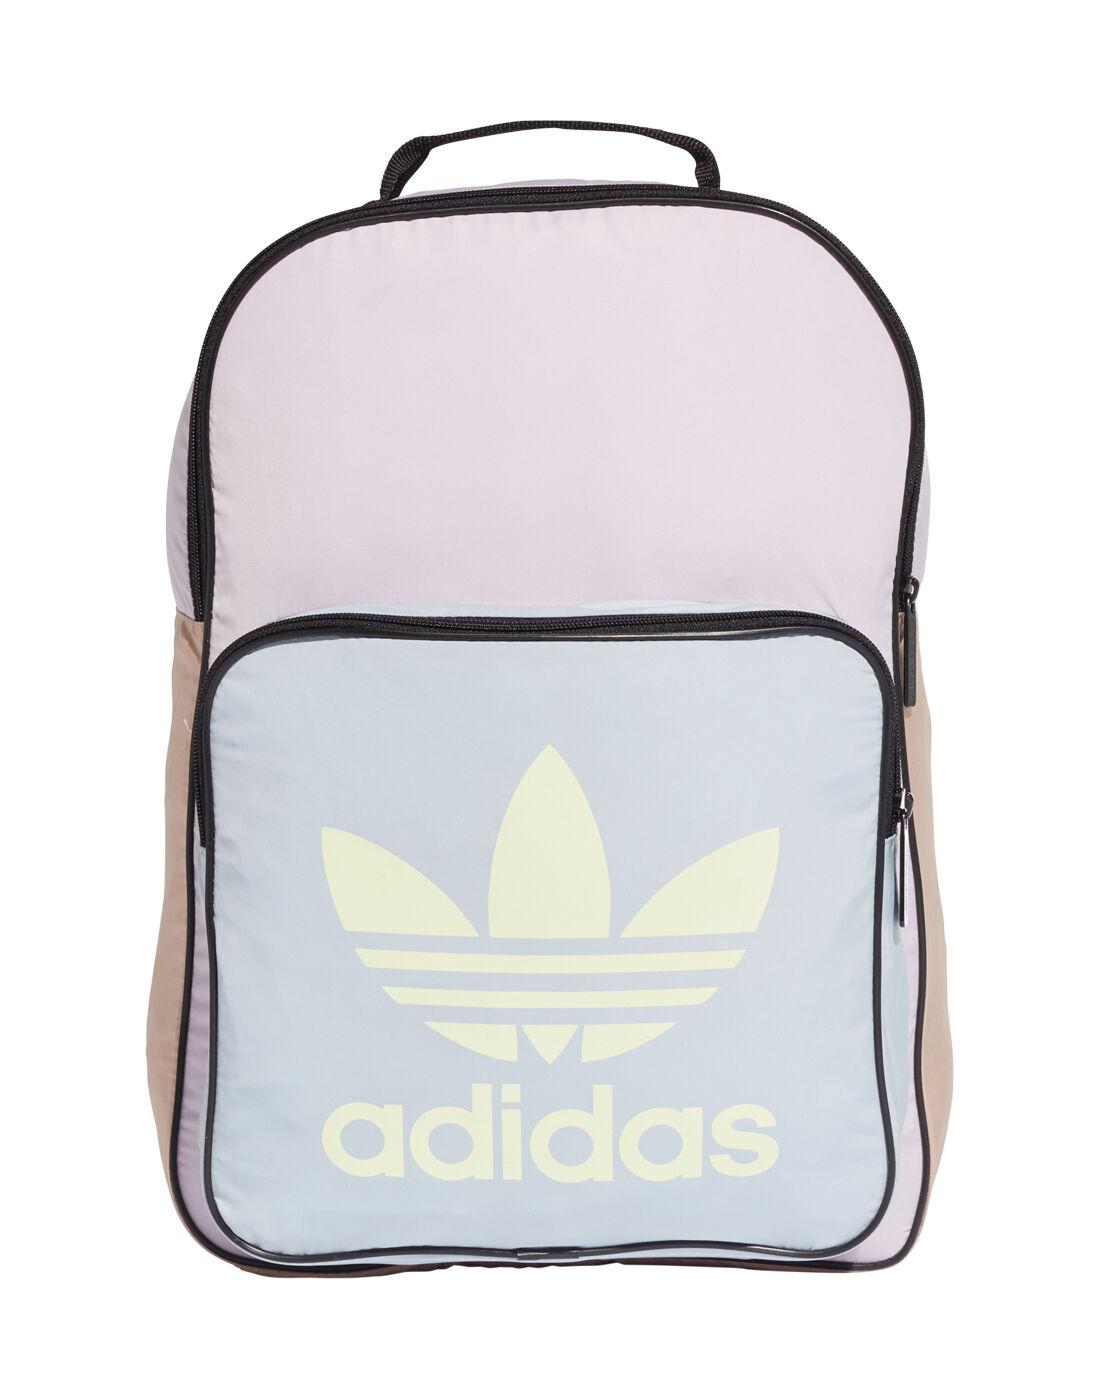 adidas sport originaux corniculé sac rose vie du style de vie rose 3bf527